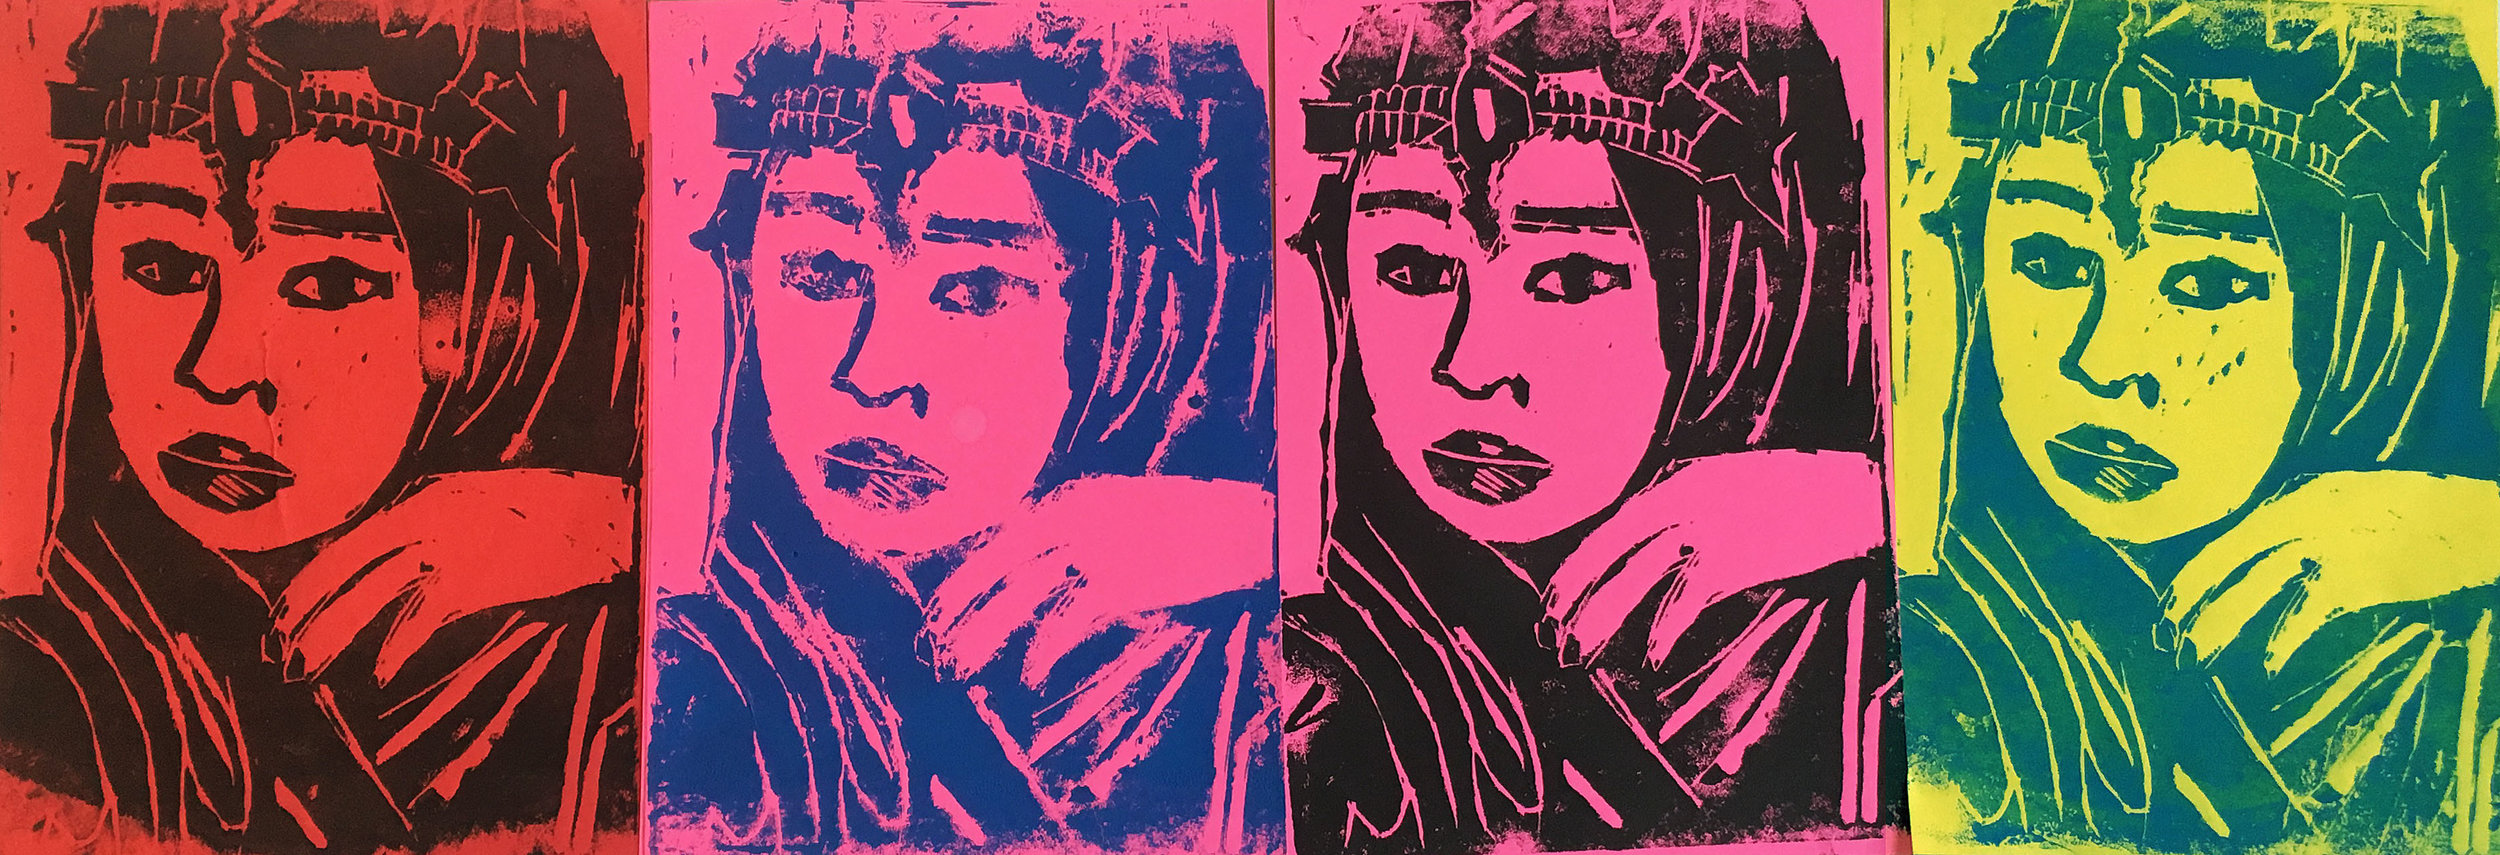 printmaking6.jpg